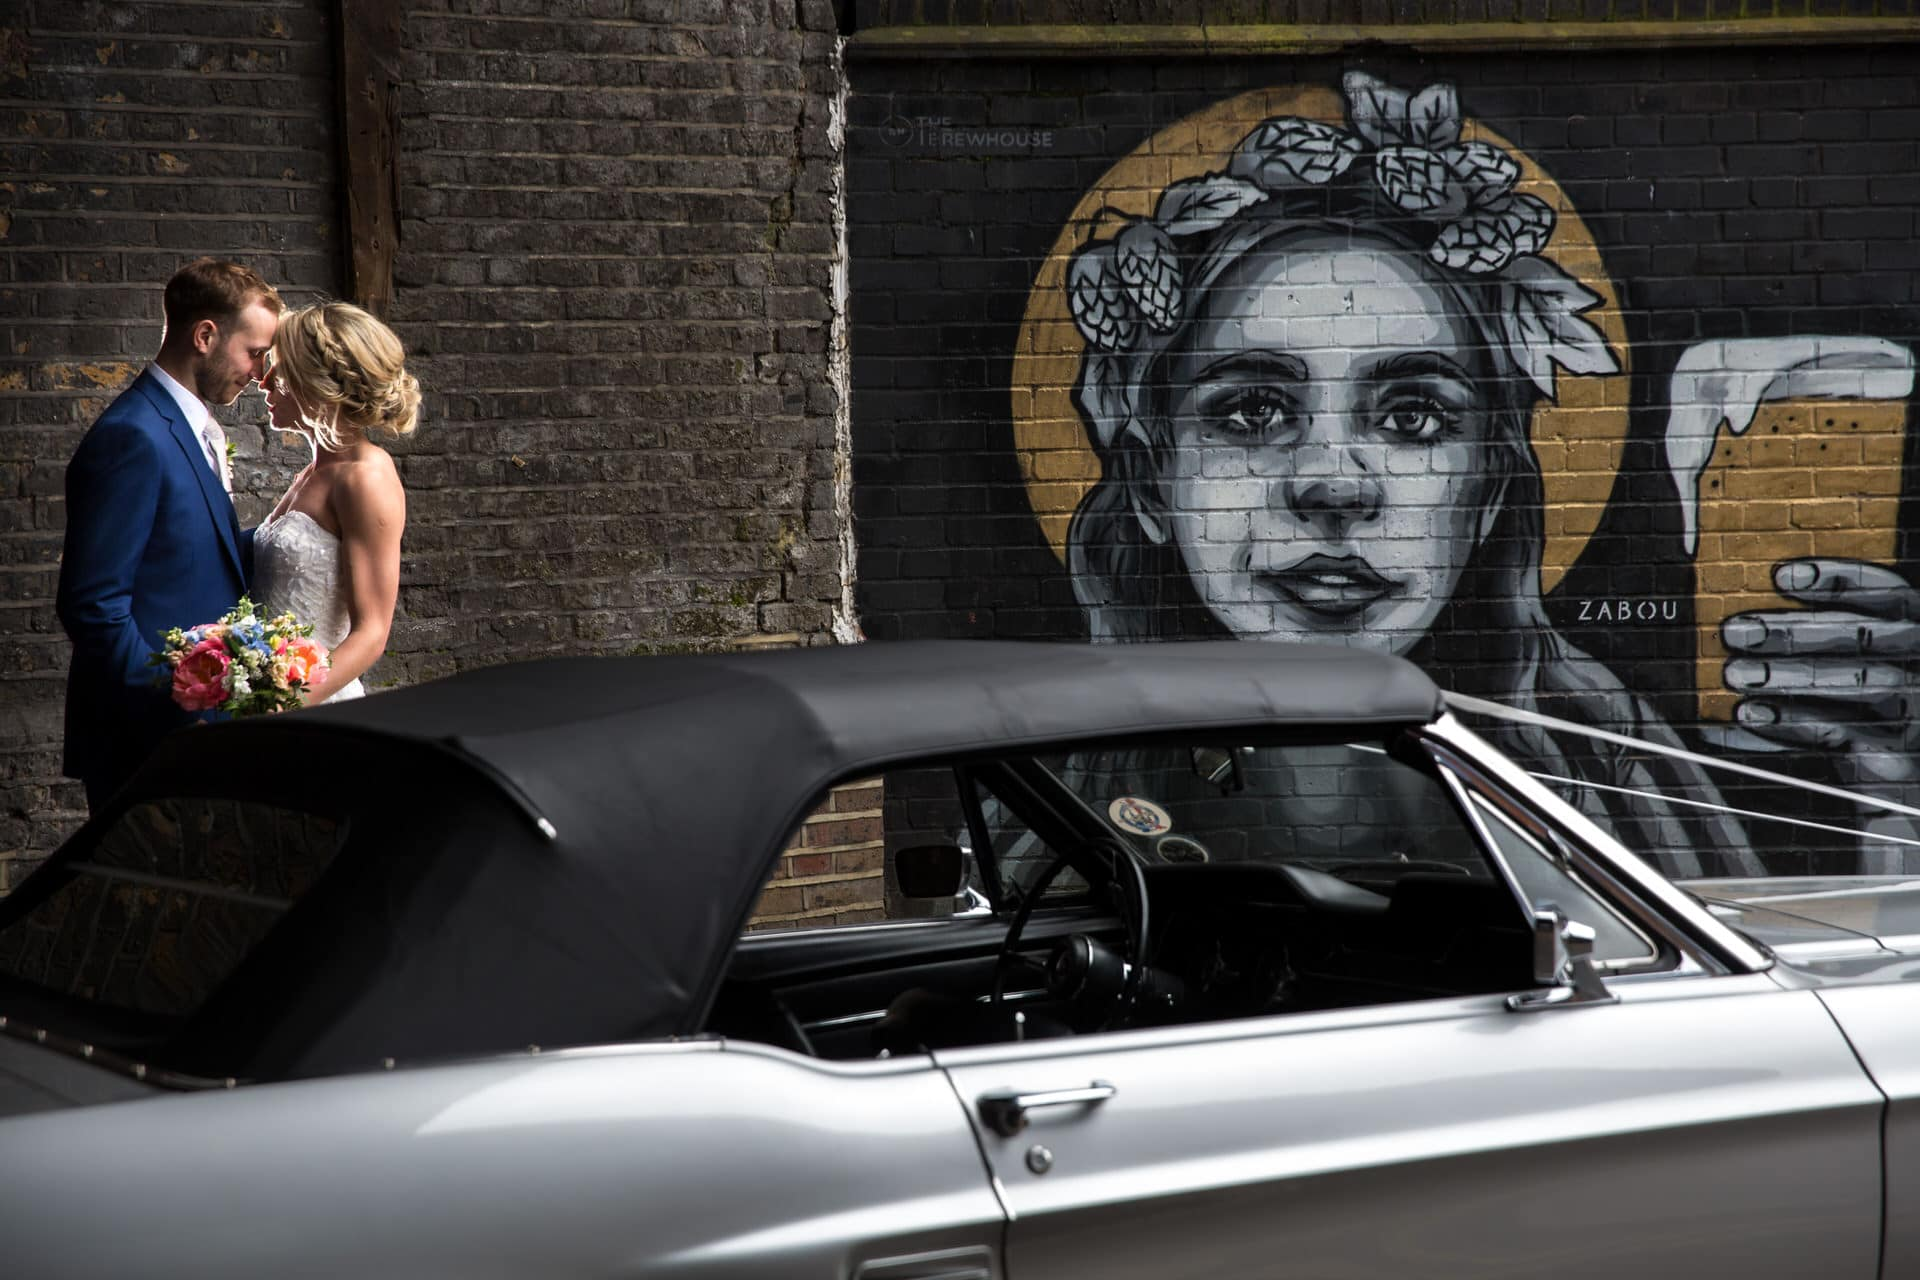 wedding couple photos mustang car street art